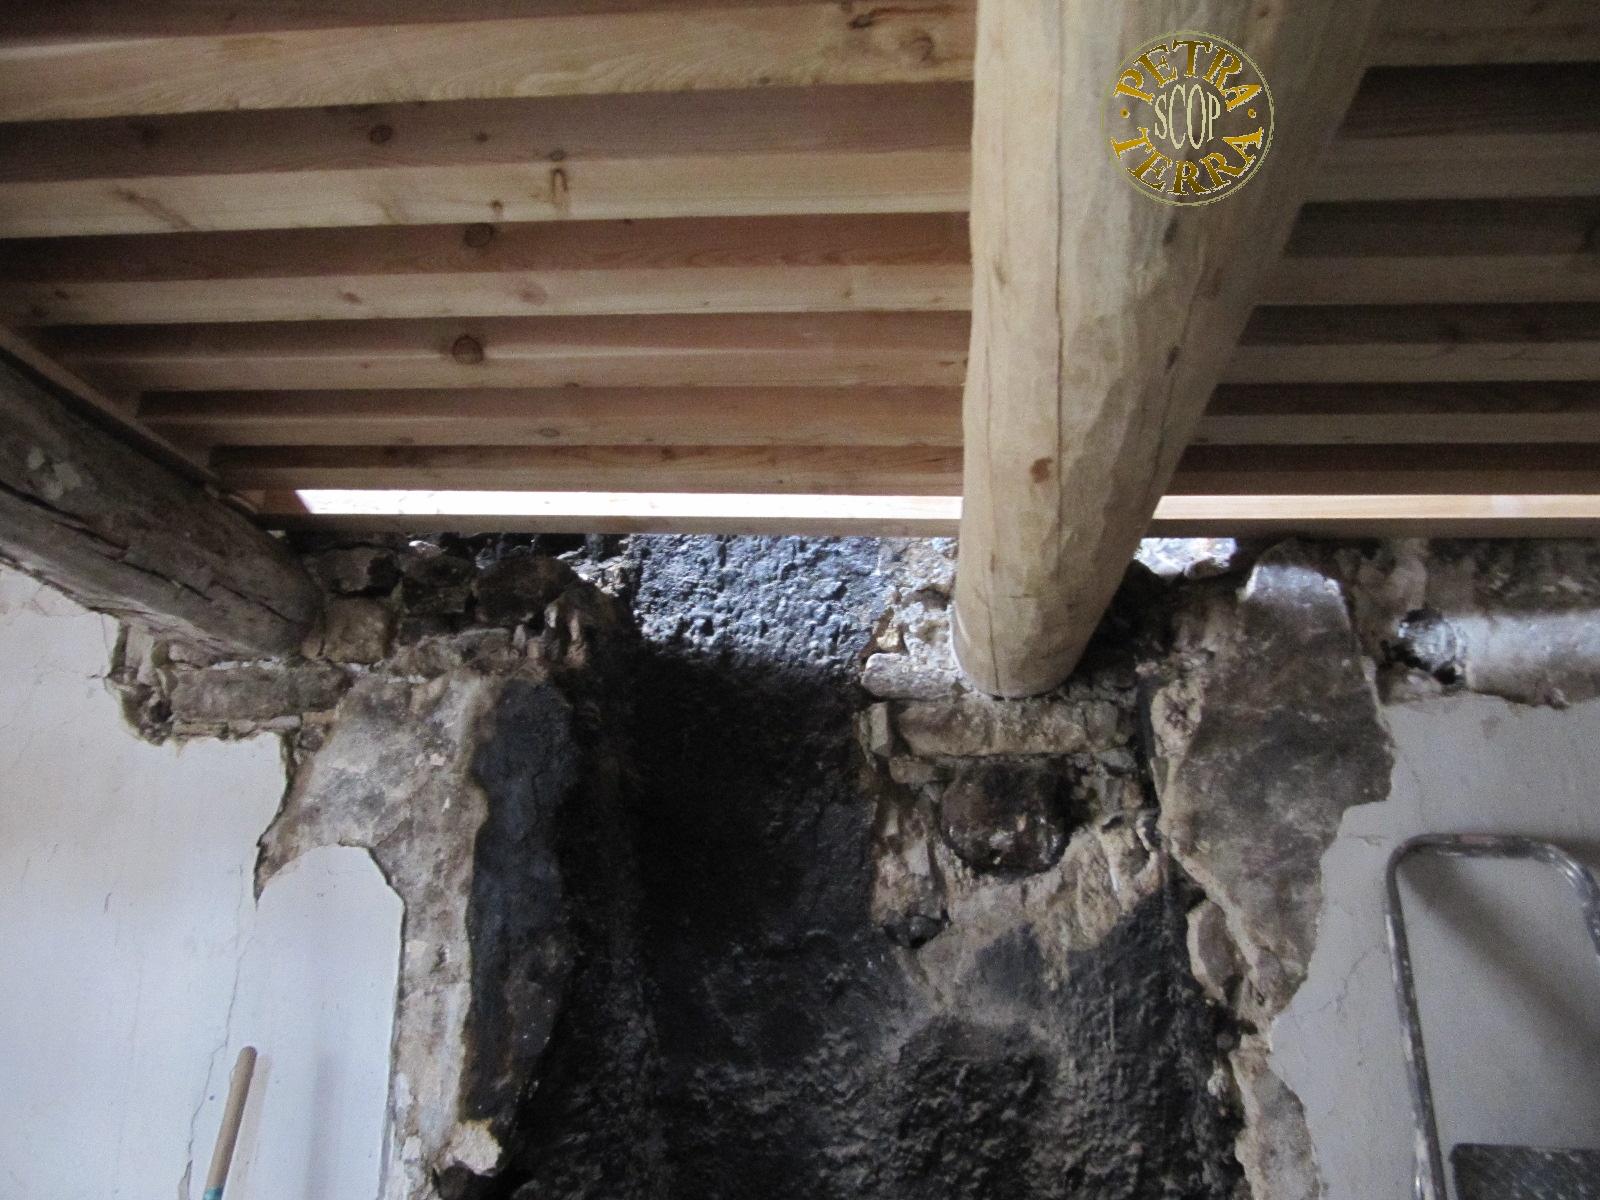 petra terra scop r alisation d 39 un plafond la fran aise. Black Bedroom Furniture Sets. Home Design Ideas